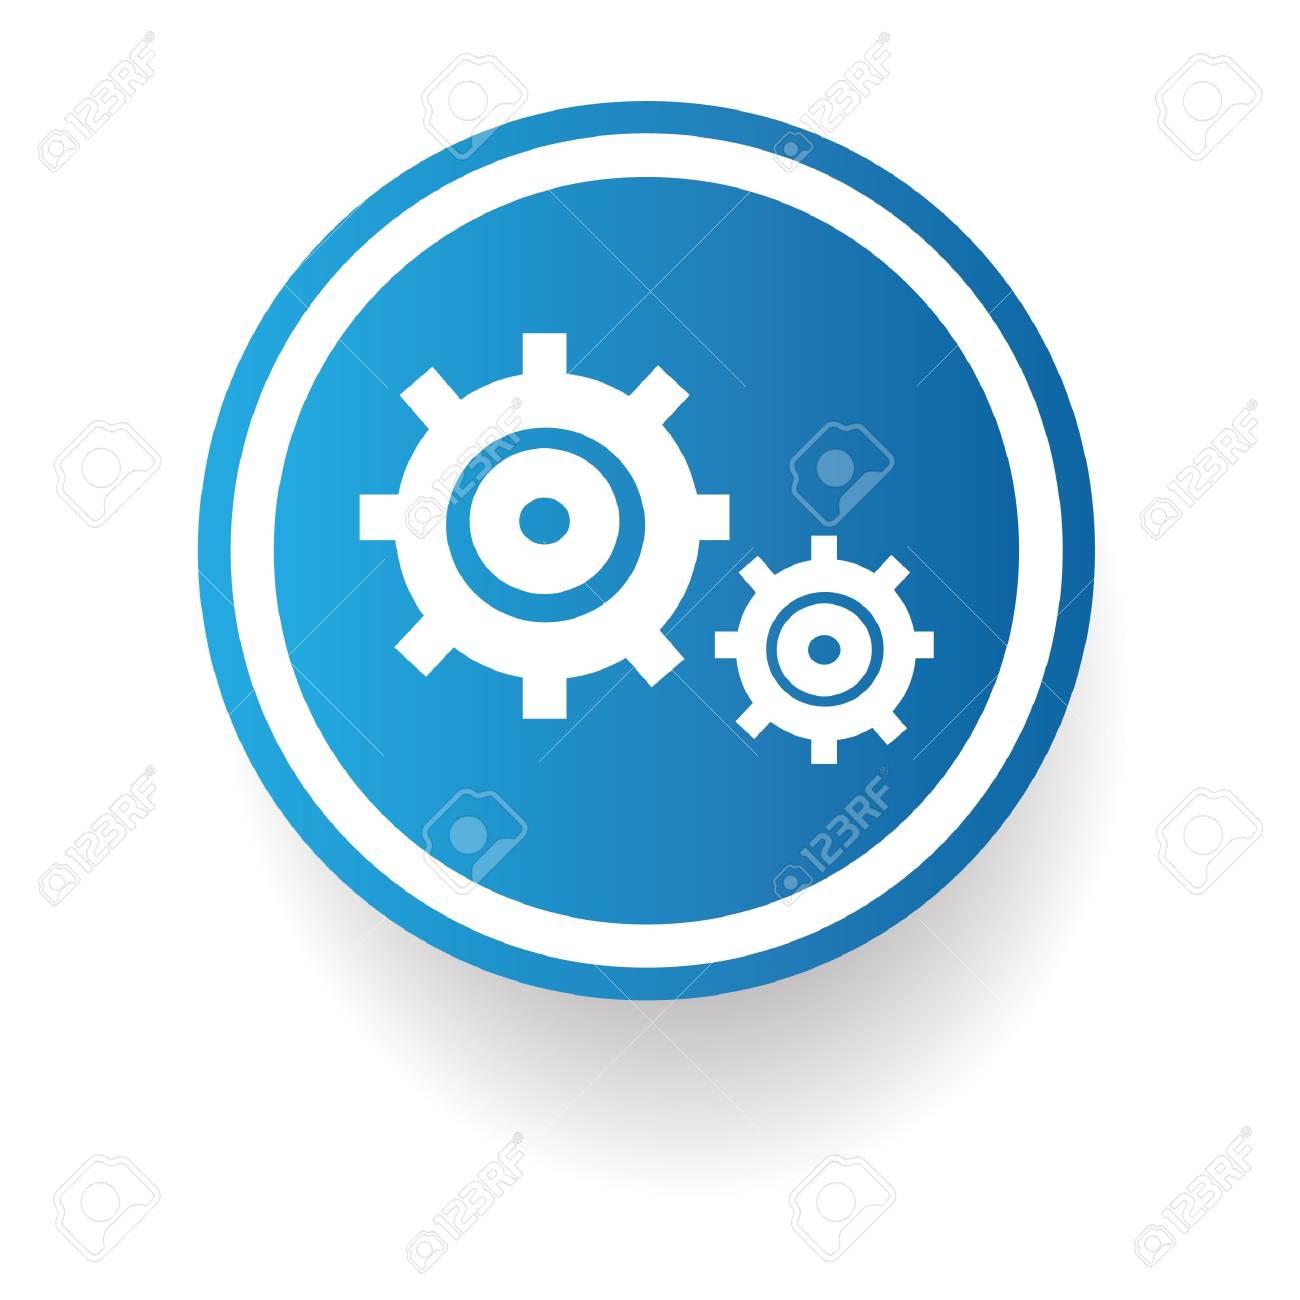 Gear sign Stock Vector - 20168089